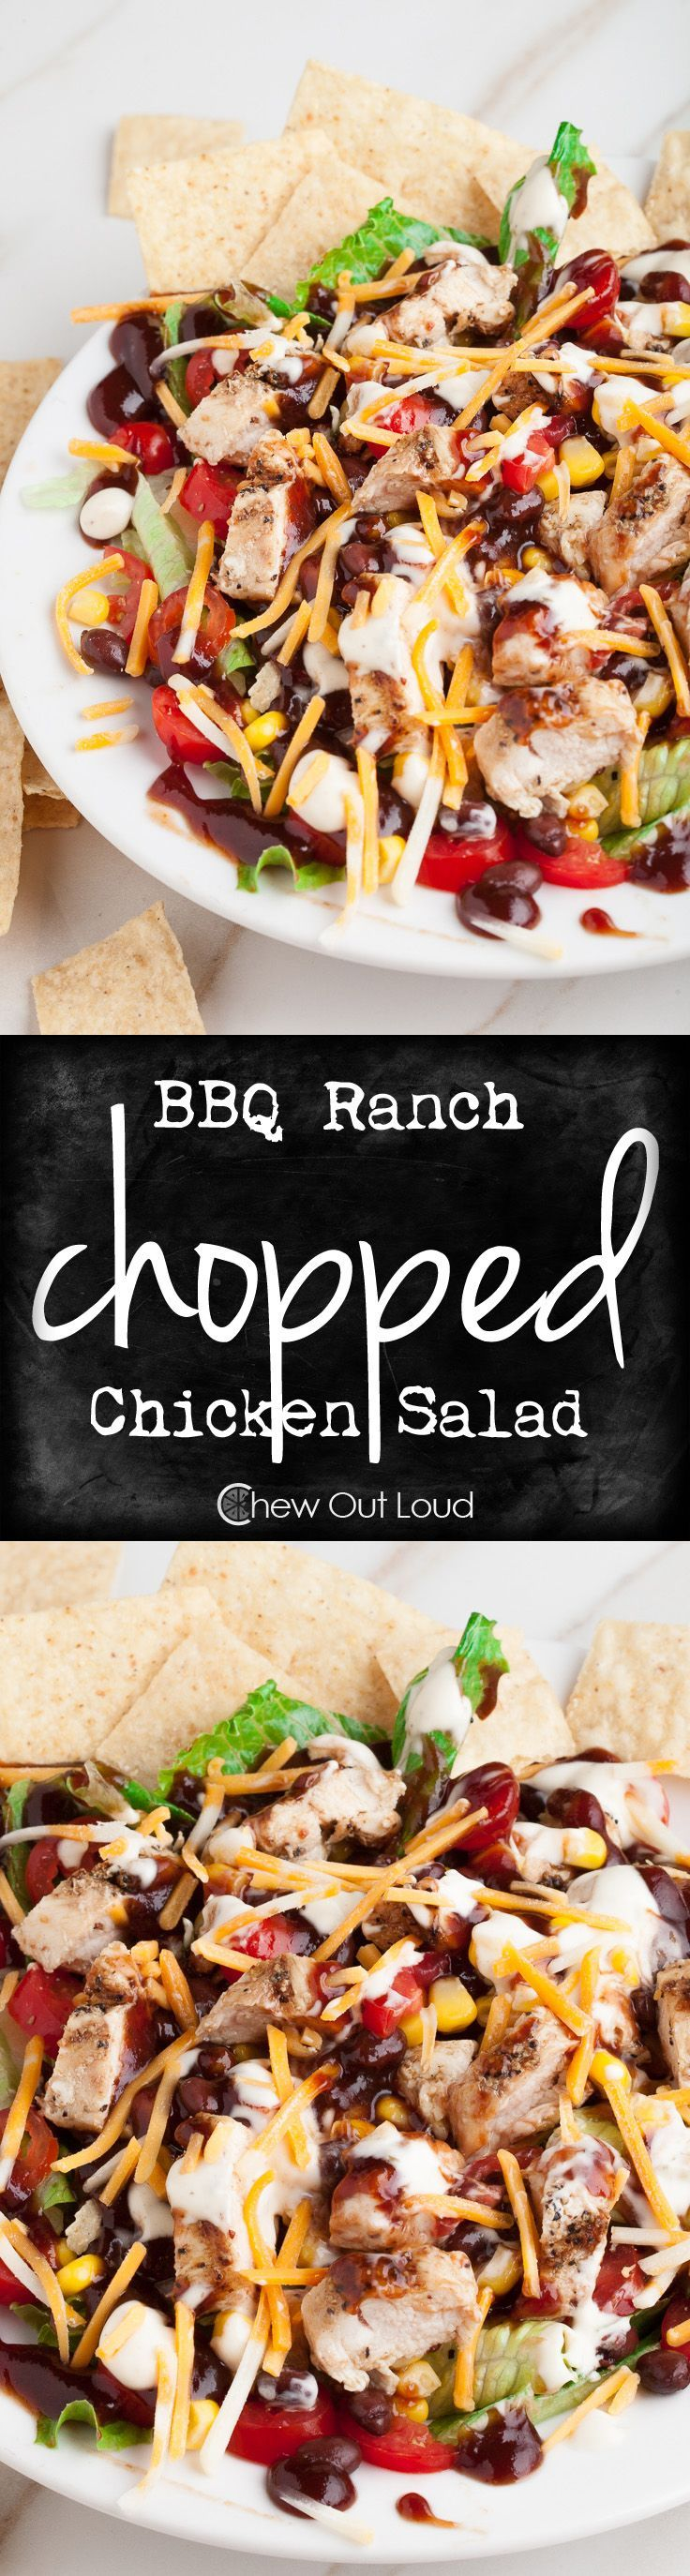 programme du r gime bbq ranch salade de poulet hach facile d licieux et nutritif awesome. Black Bedroom Furniture Sets. Home Design Ideas